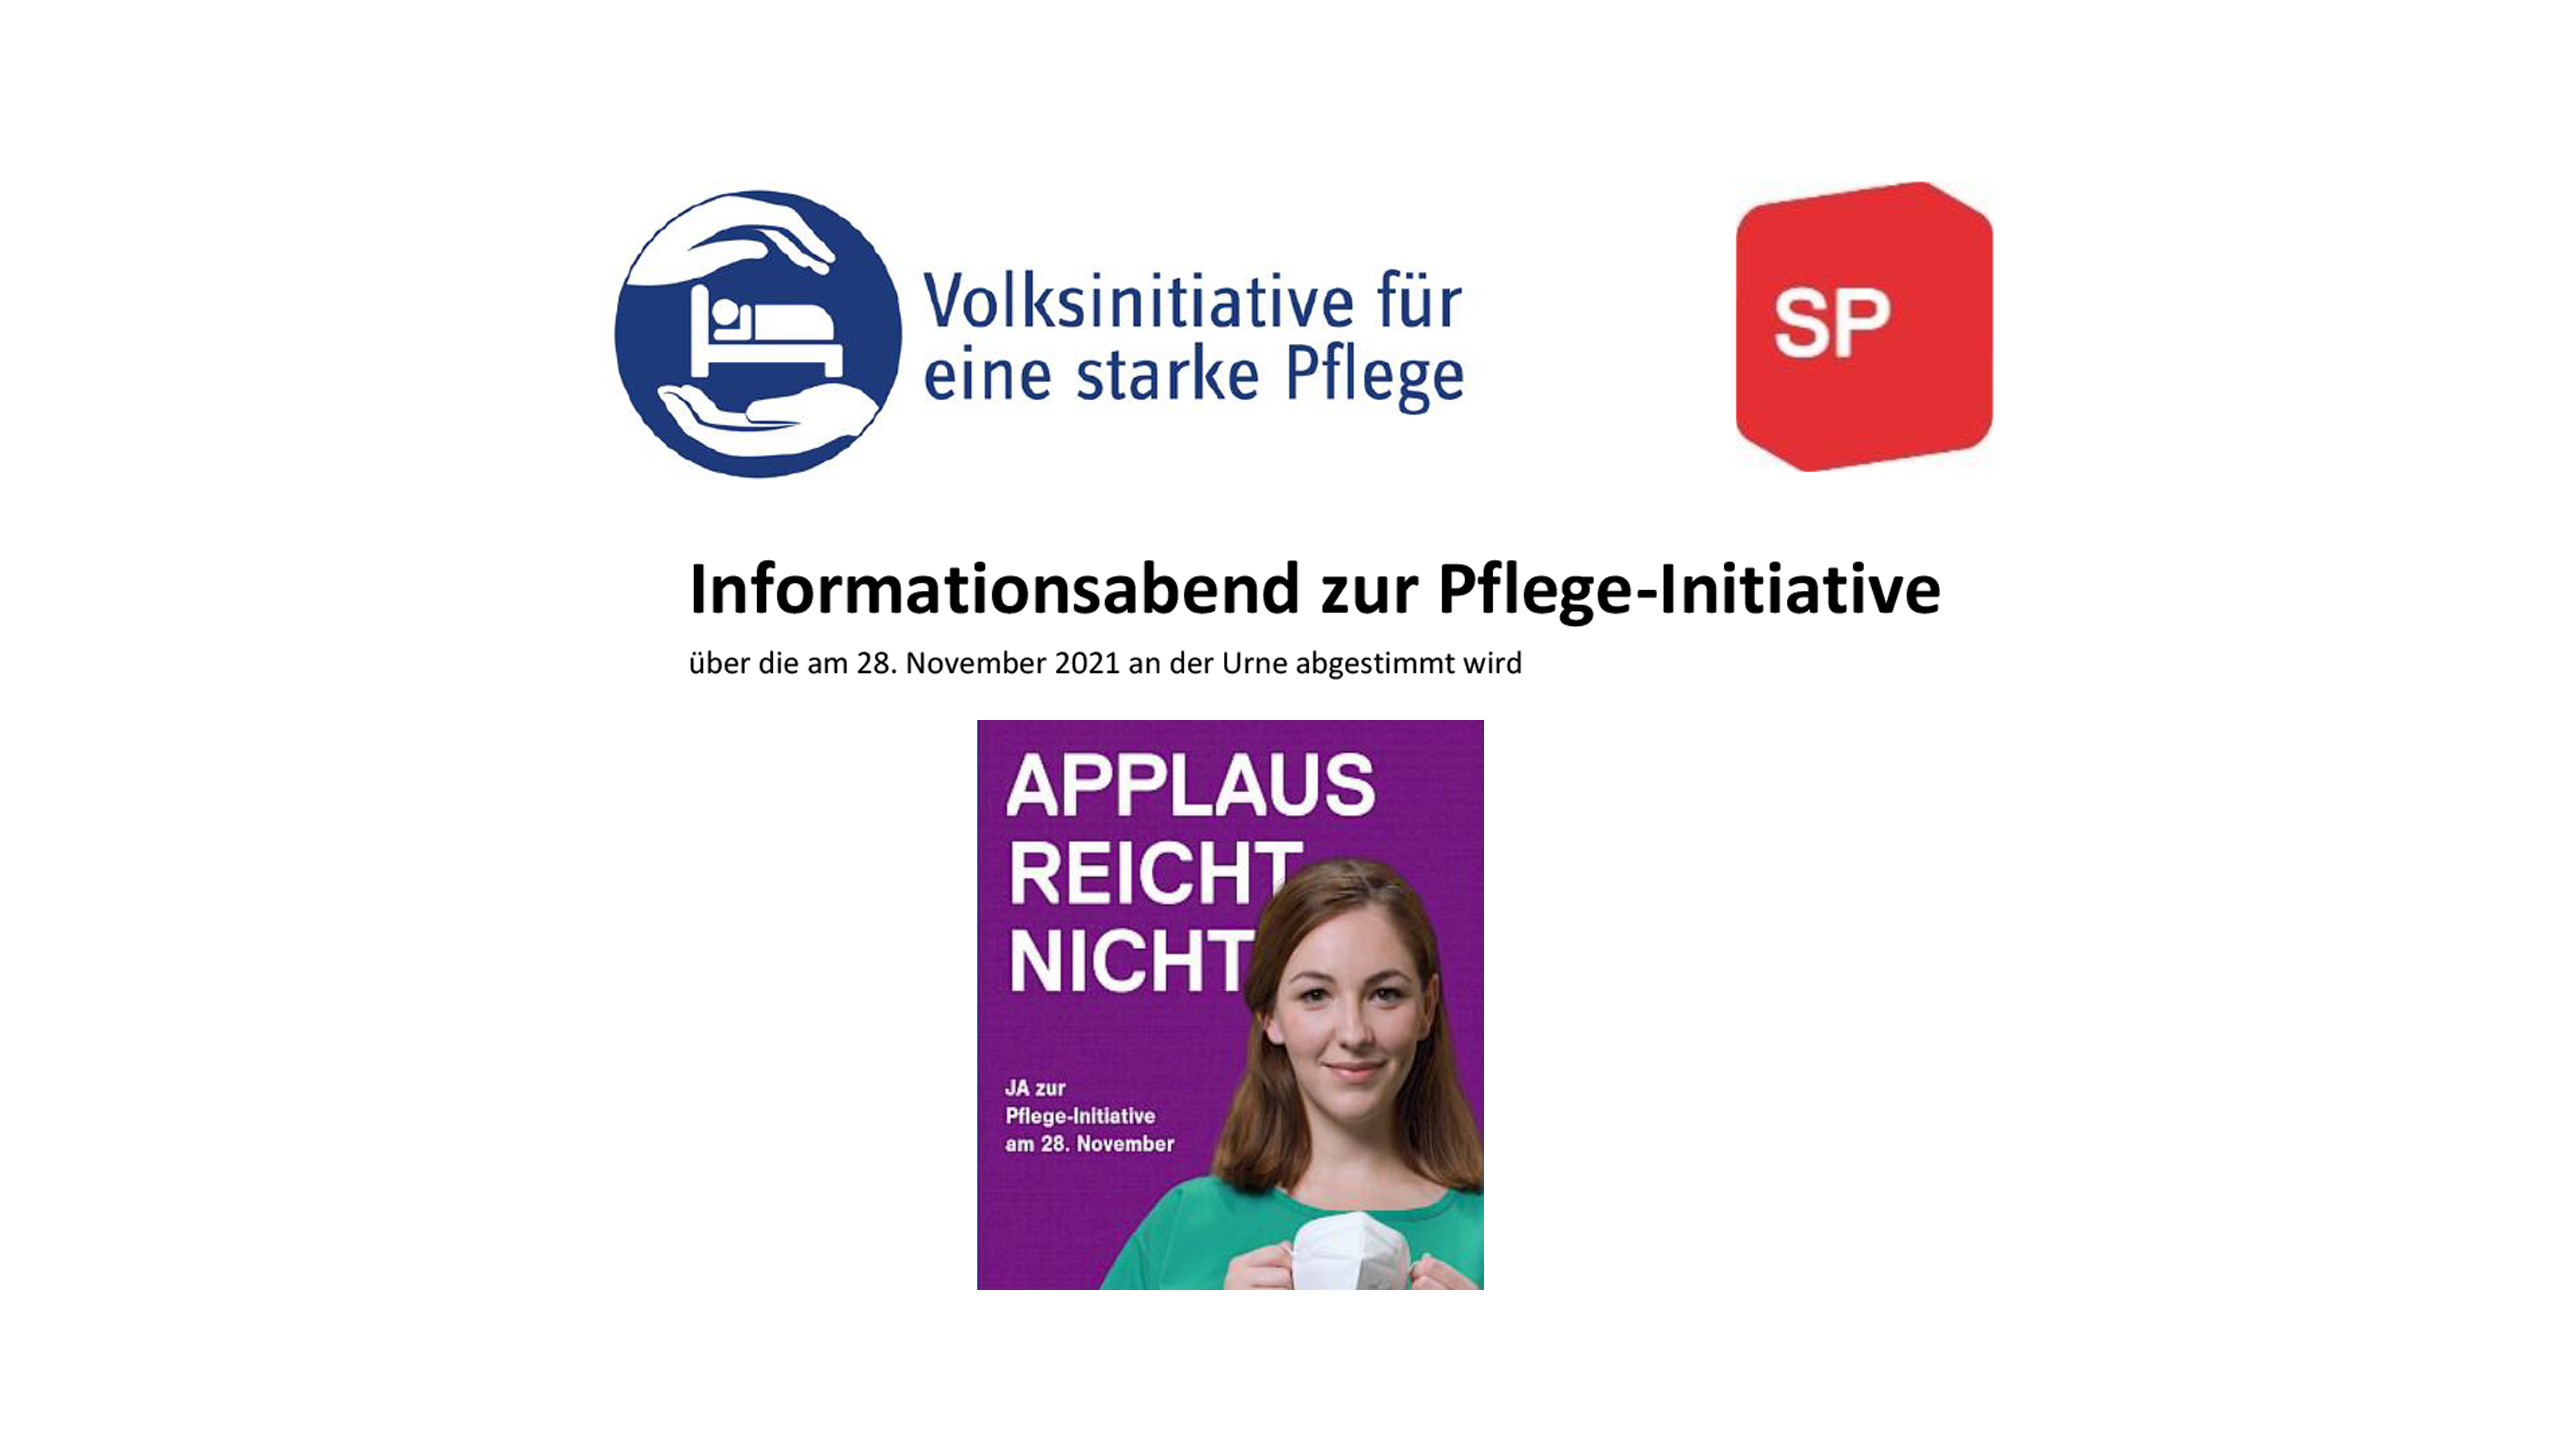 Infobild SP Infoabend Pflege-Initiative